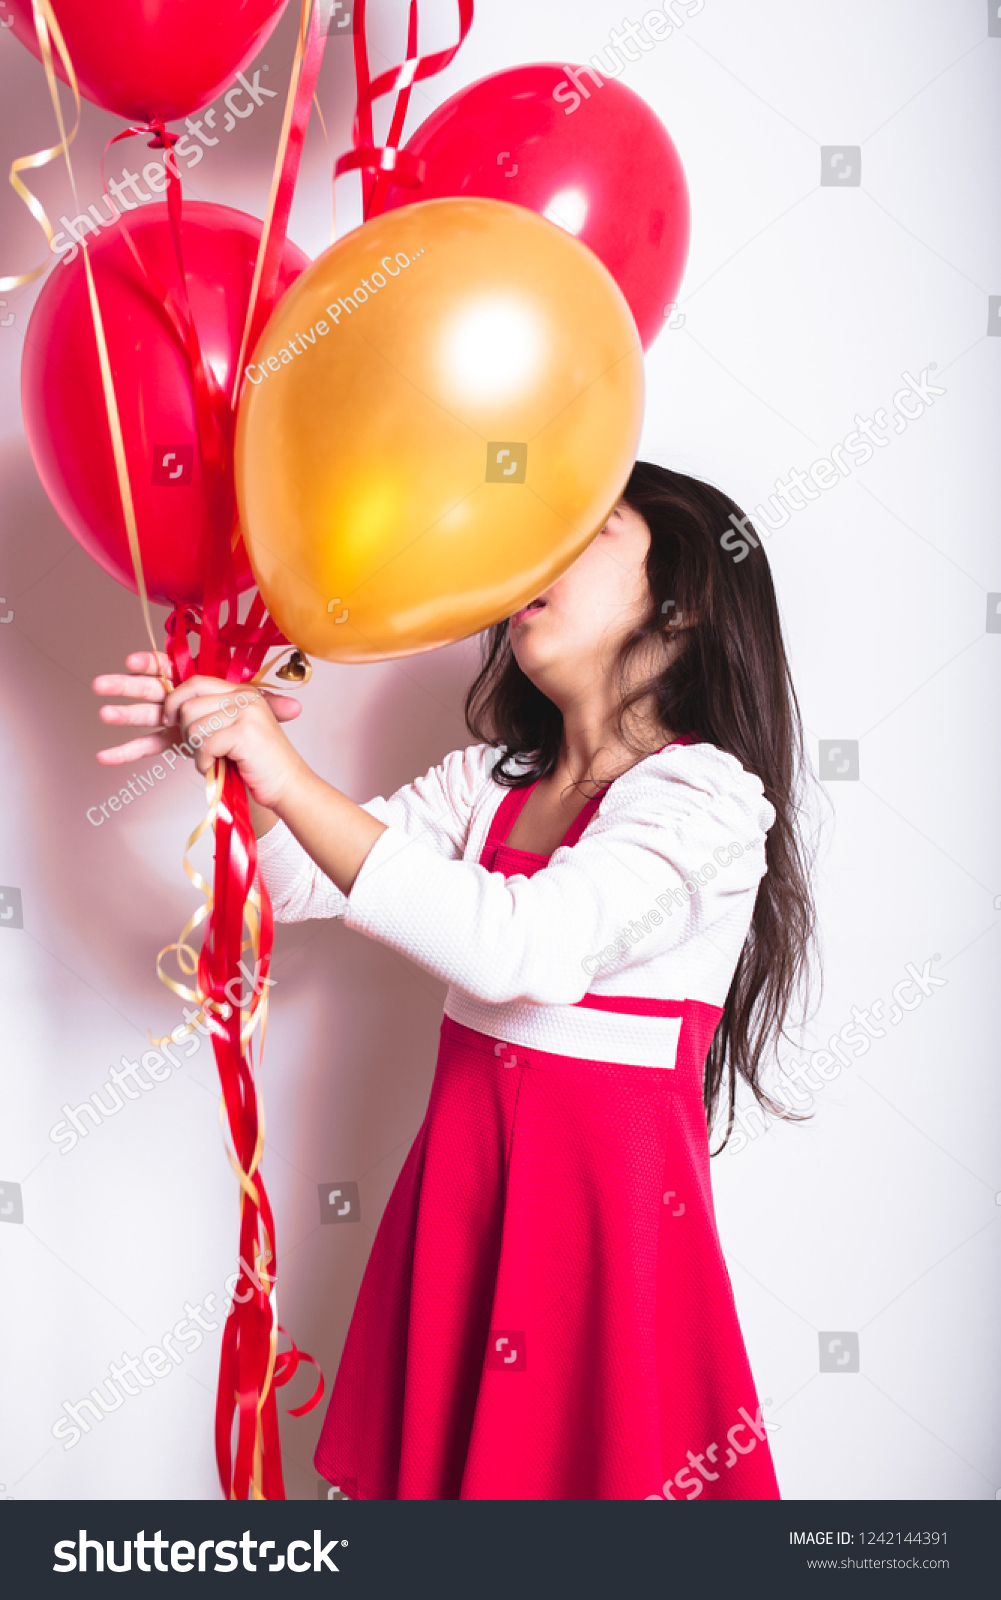 Baby Girl Holding Balloons Celebrating Her Birthday